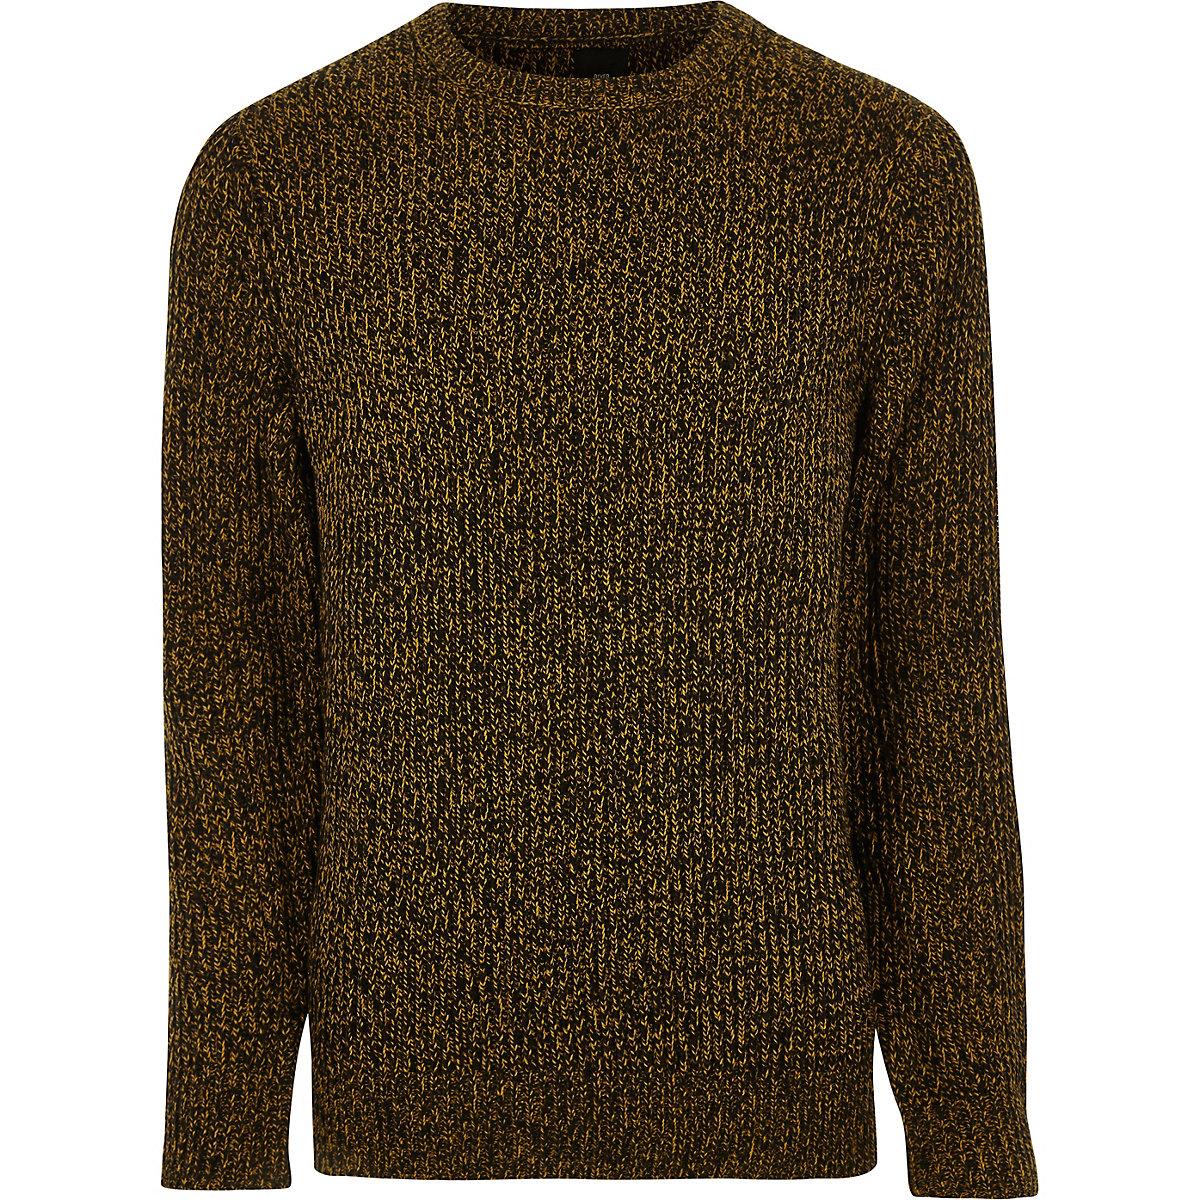 Mustard yellow crew neck knit sweater